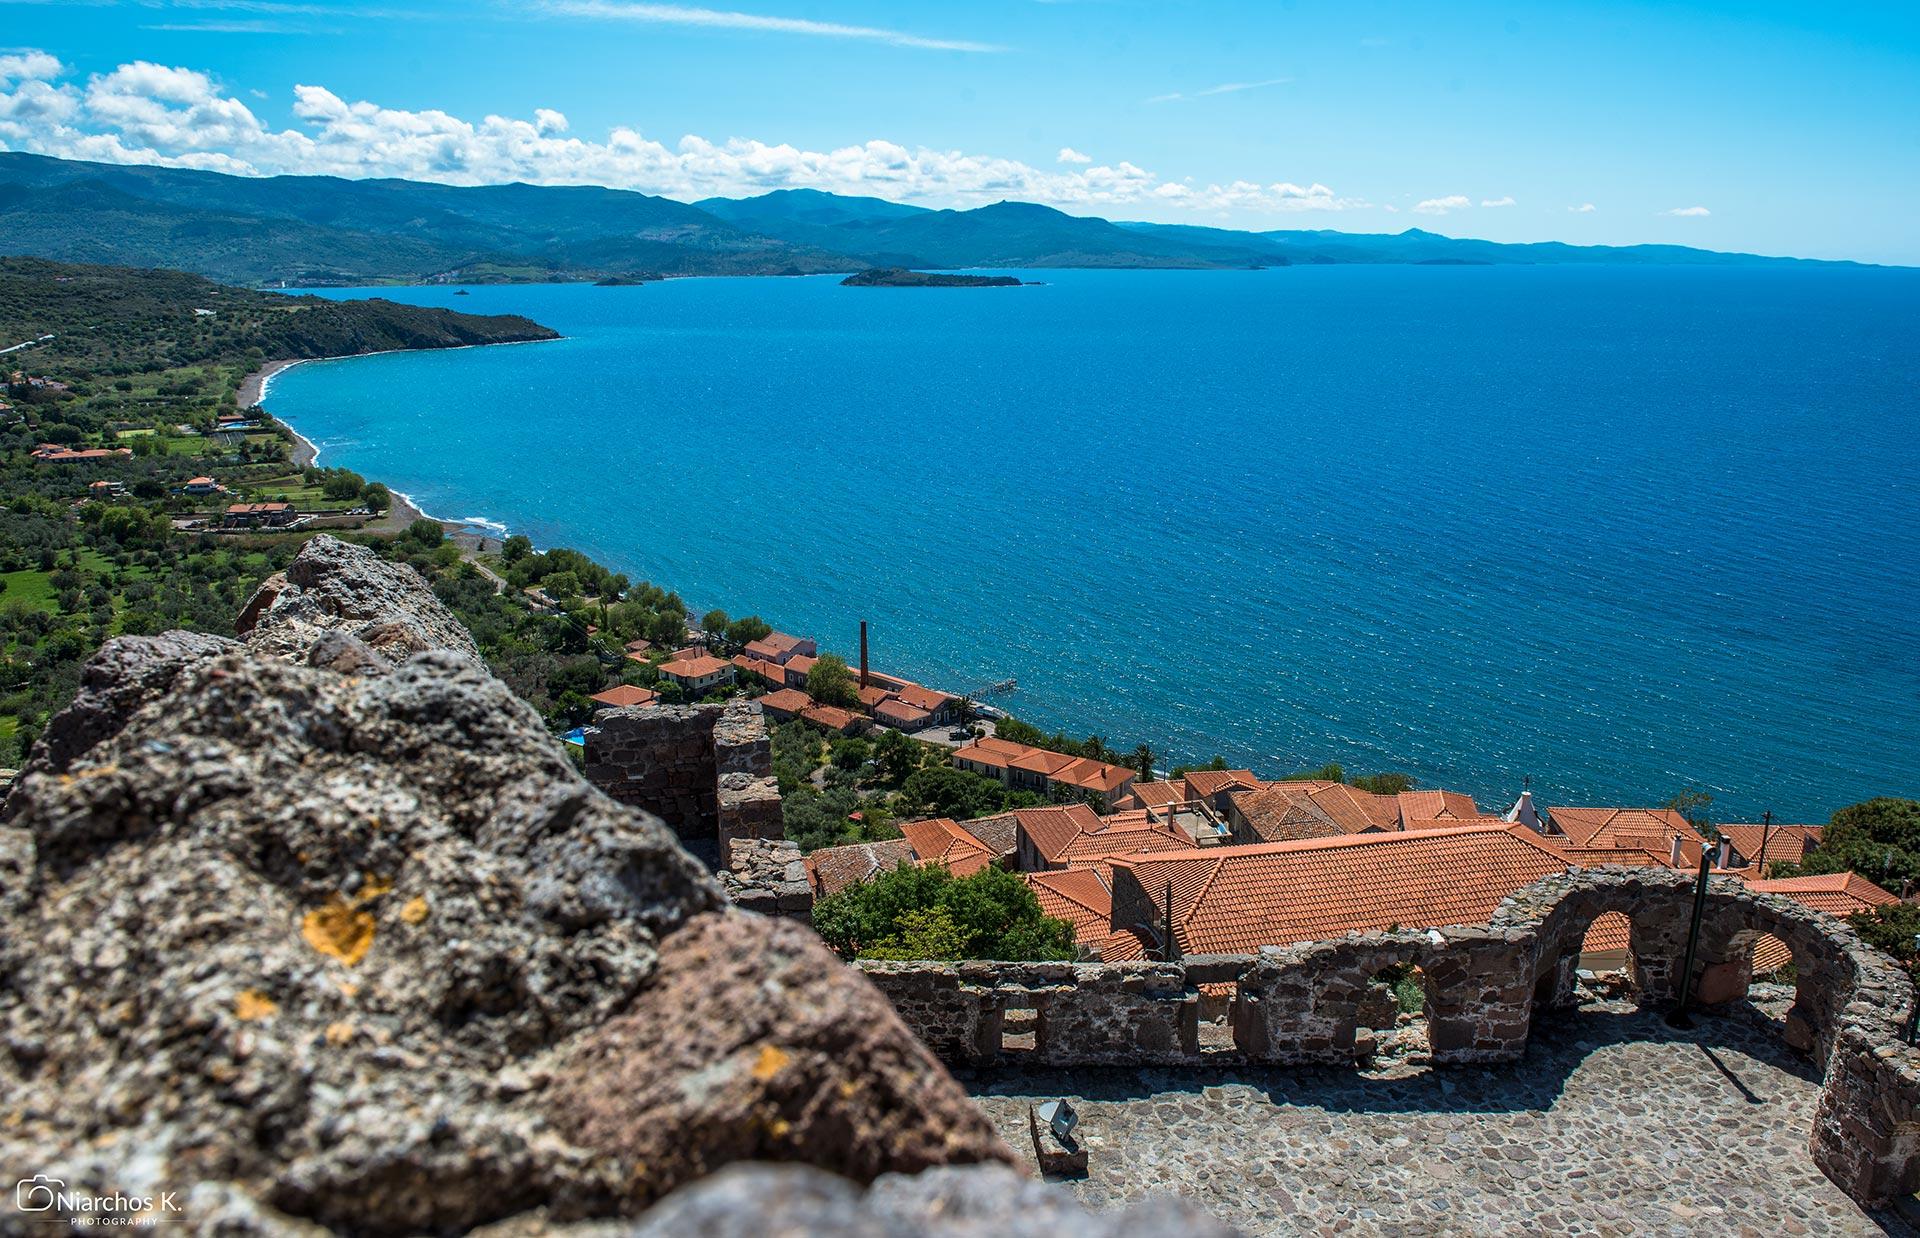 milelja serenity castle view